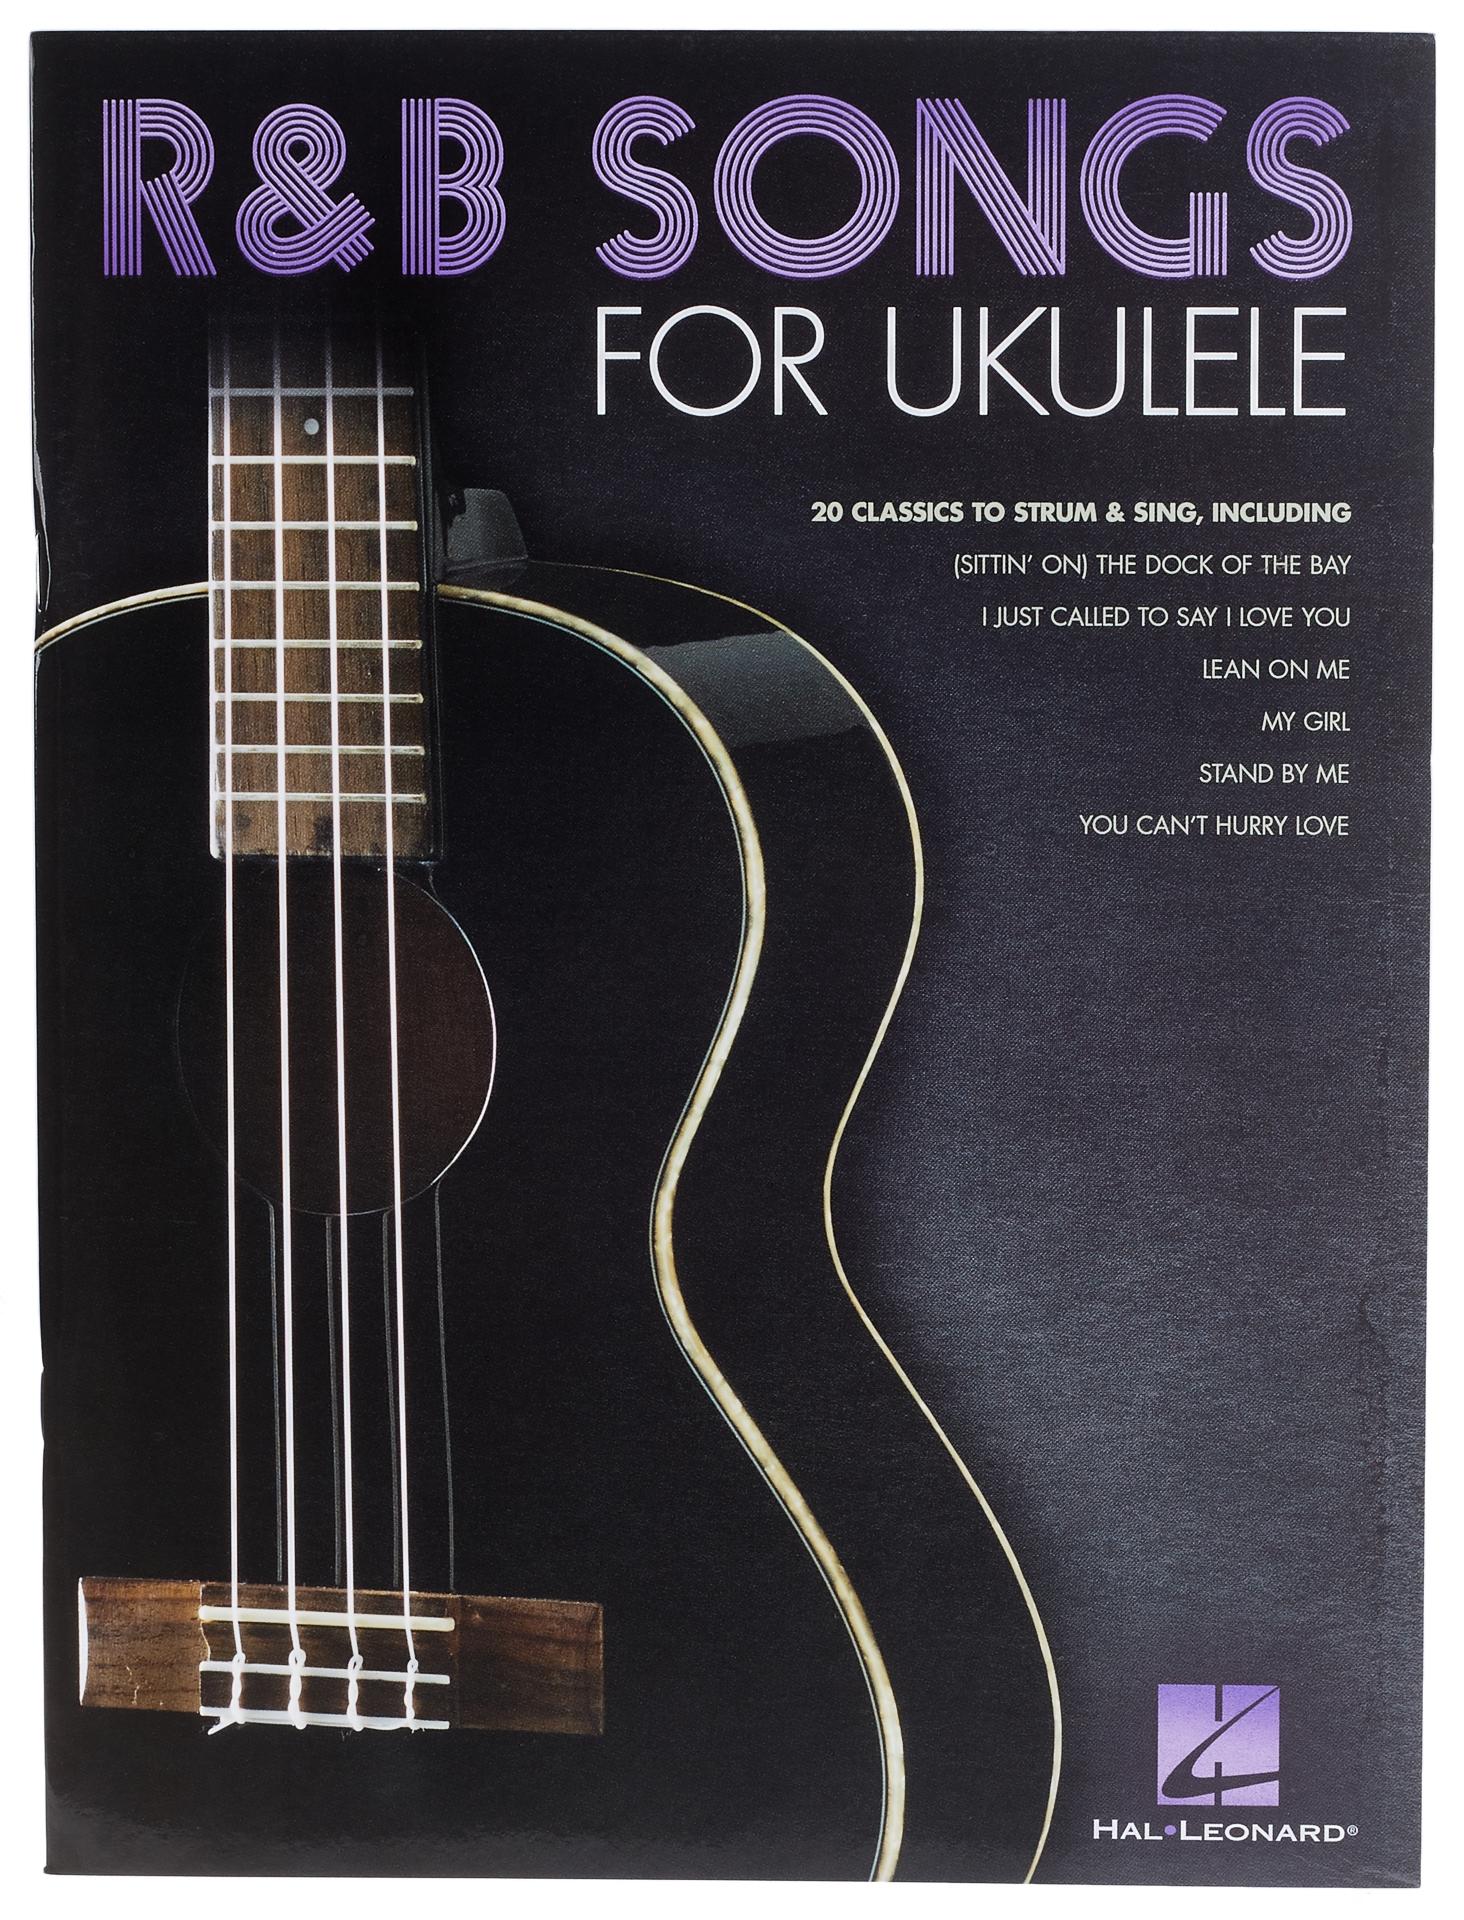 MS R&B Songs For Ukulele